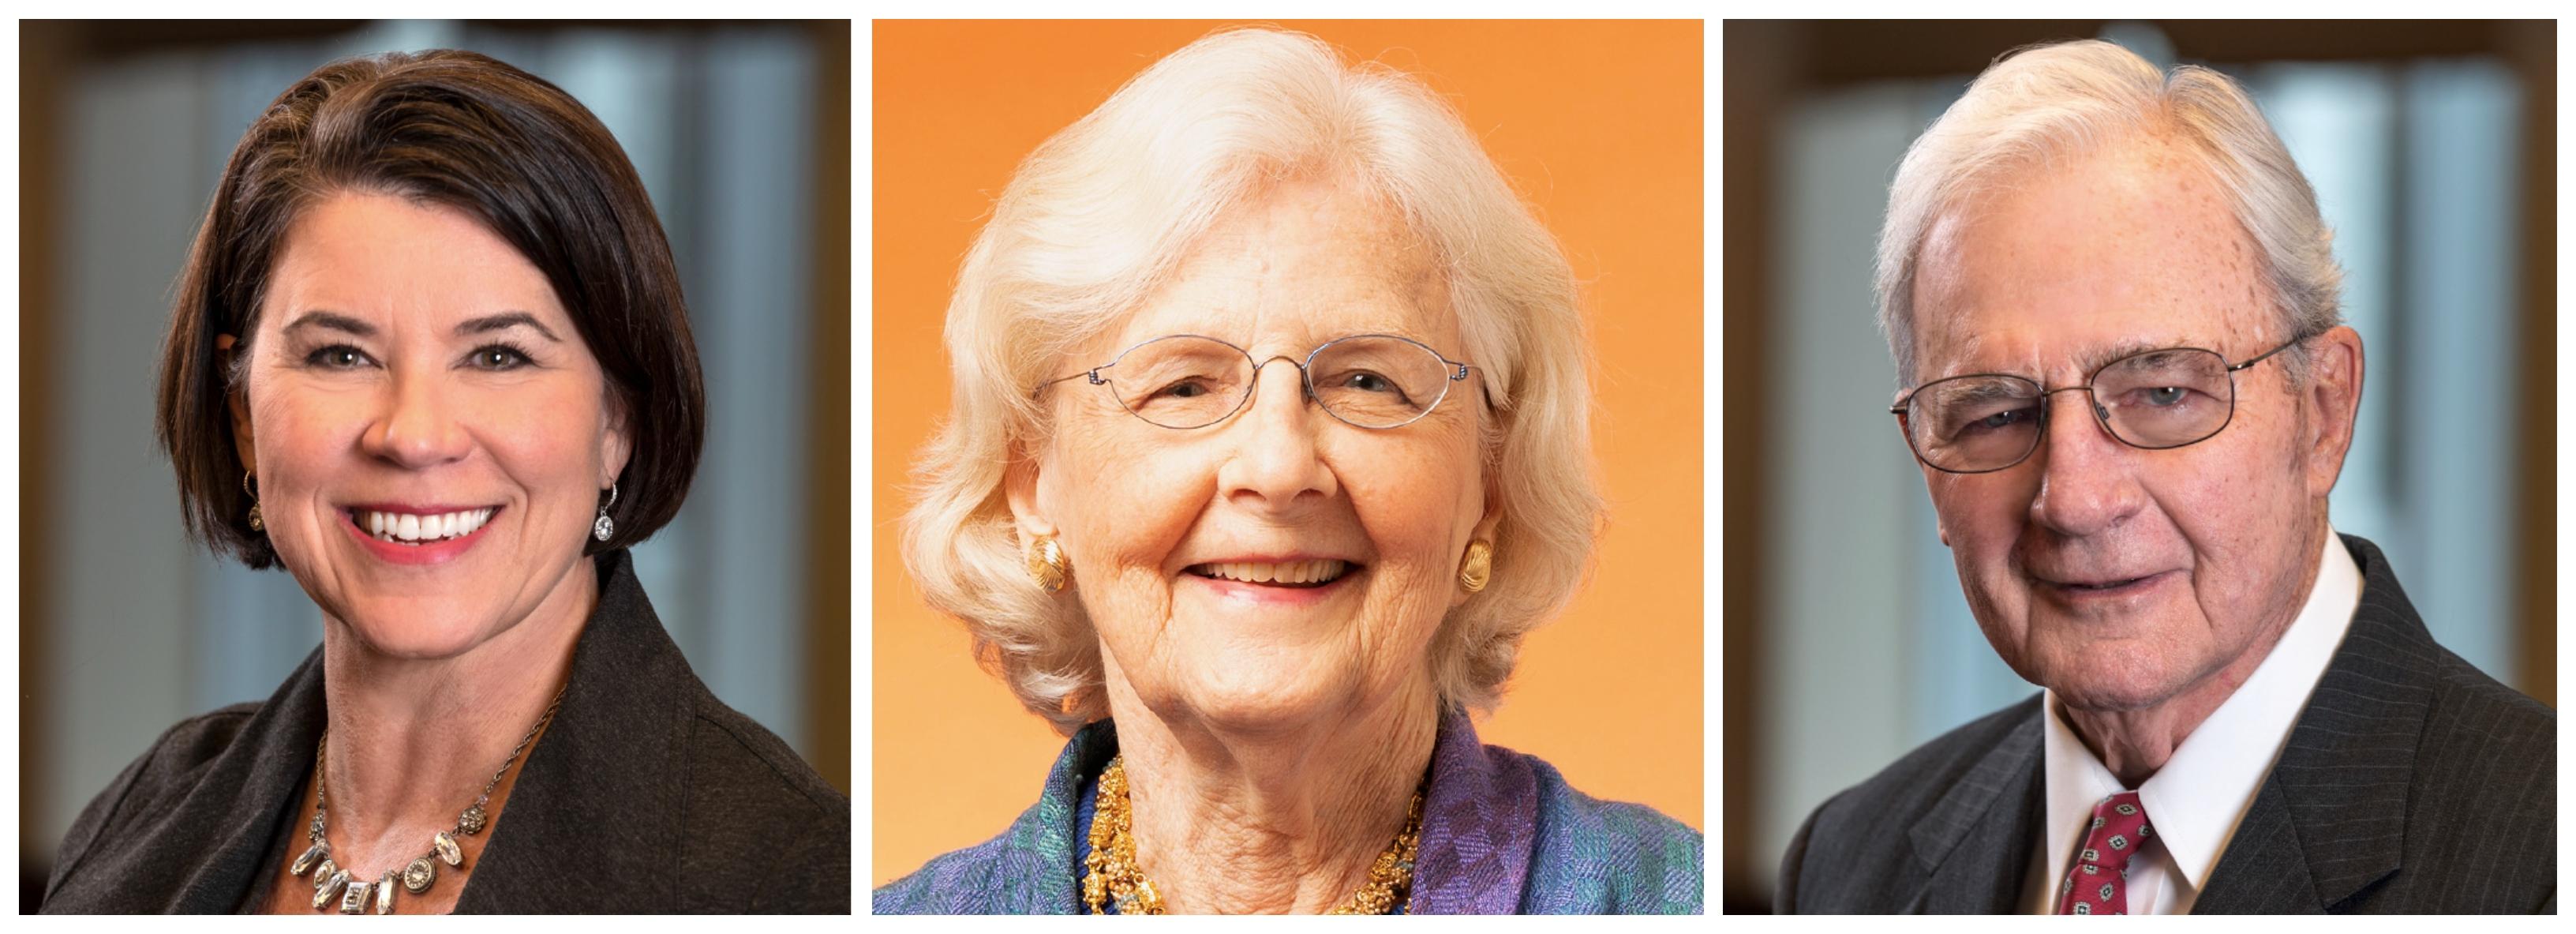 Meet the ERS Board: Jenny Payne, Elizabeth Lilly & Arnie Austin